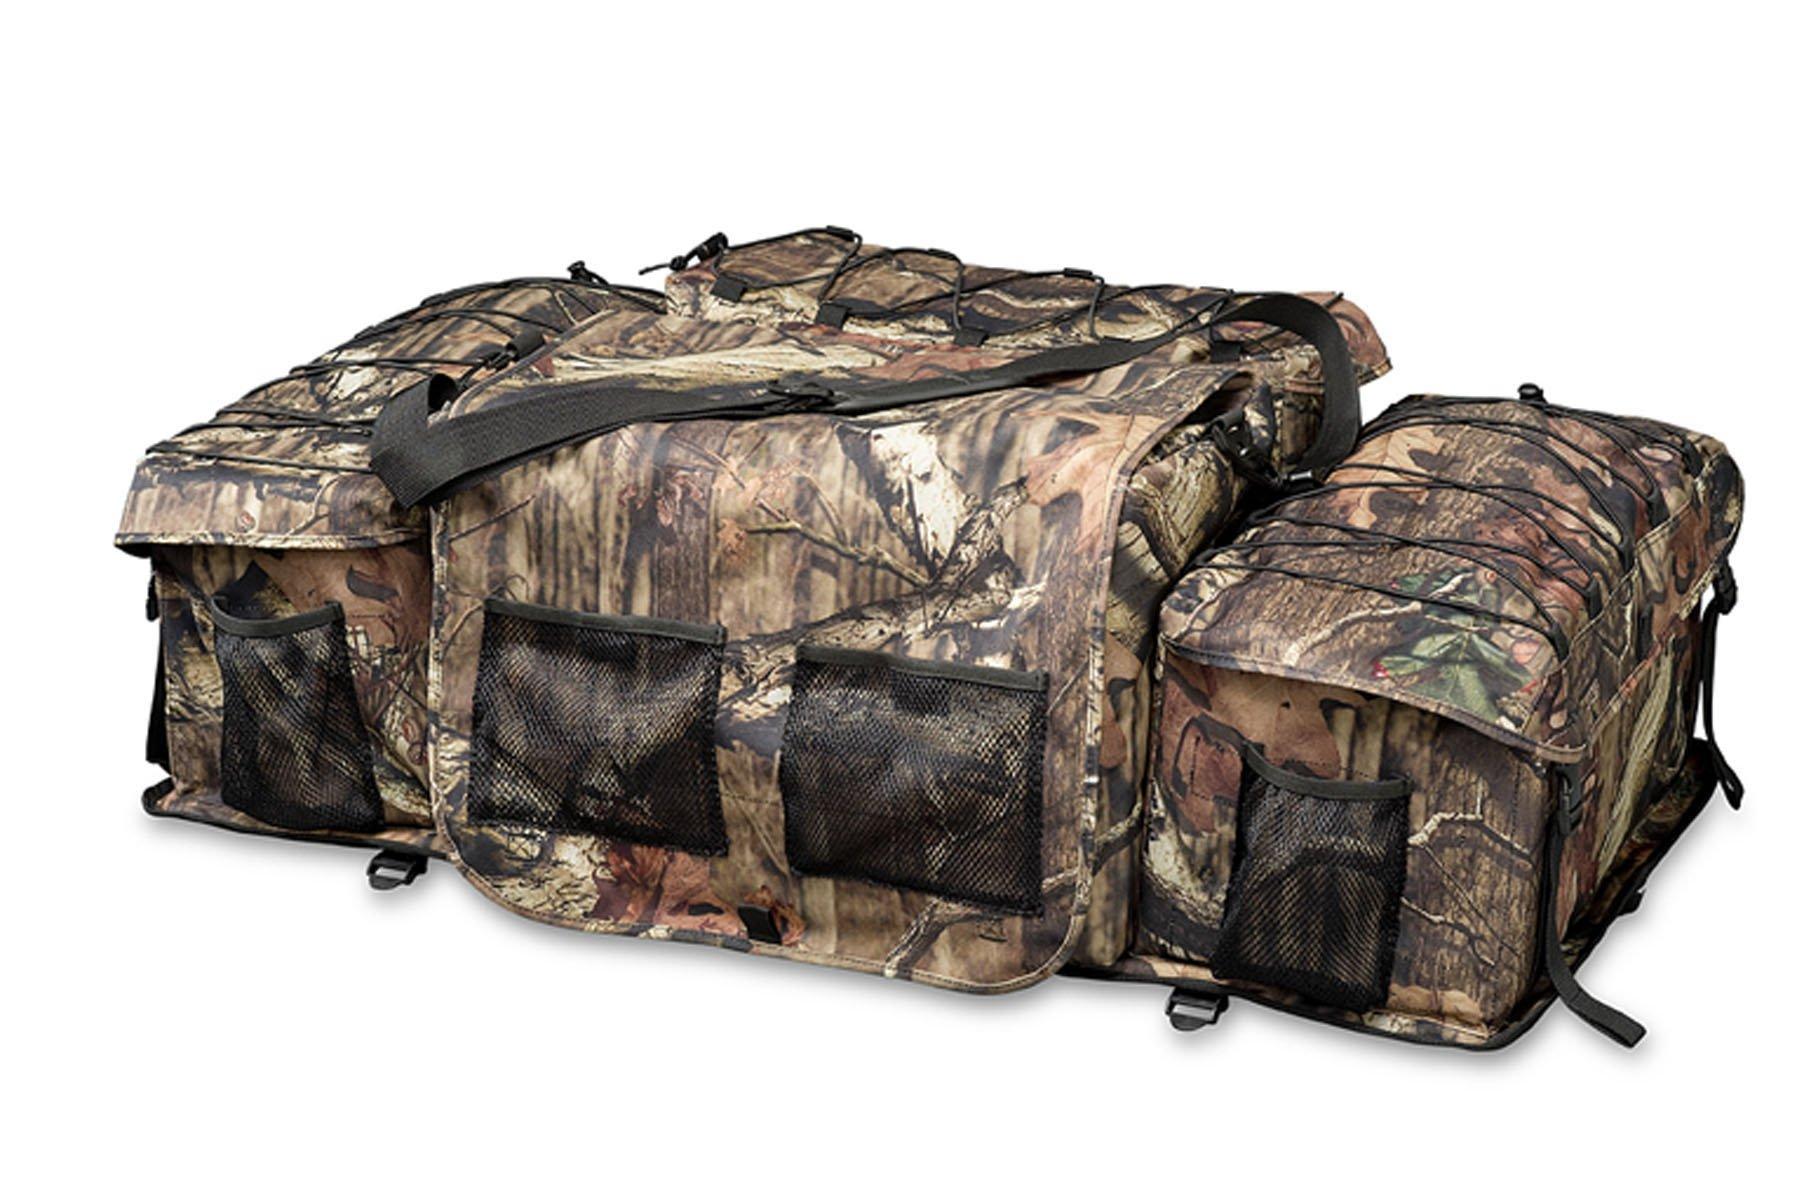 Raider ATV Rack Bag REAR Storage Gear Bag Deluxe Mossy Oak Infinity Camouflage